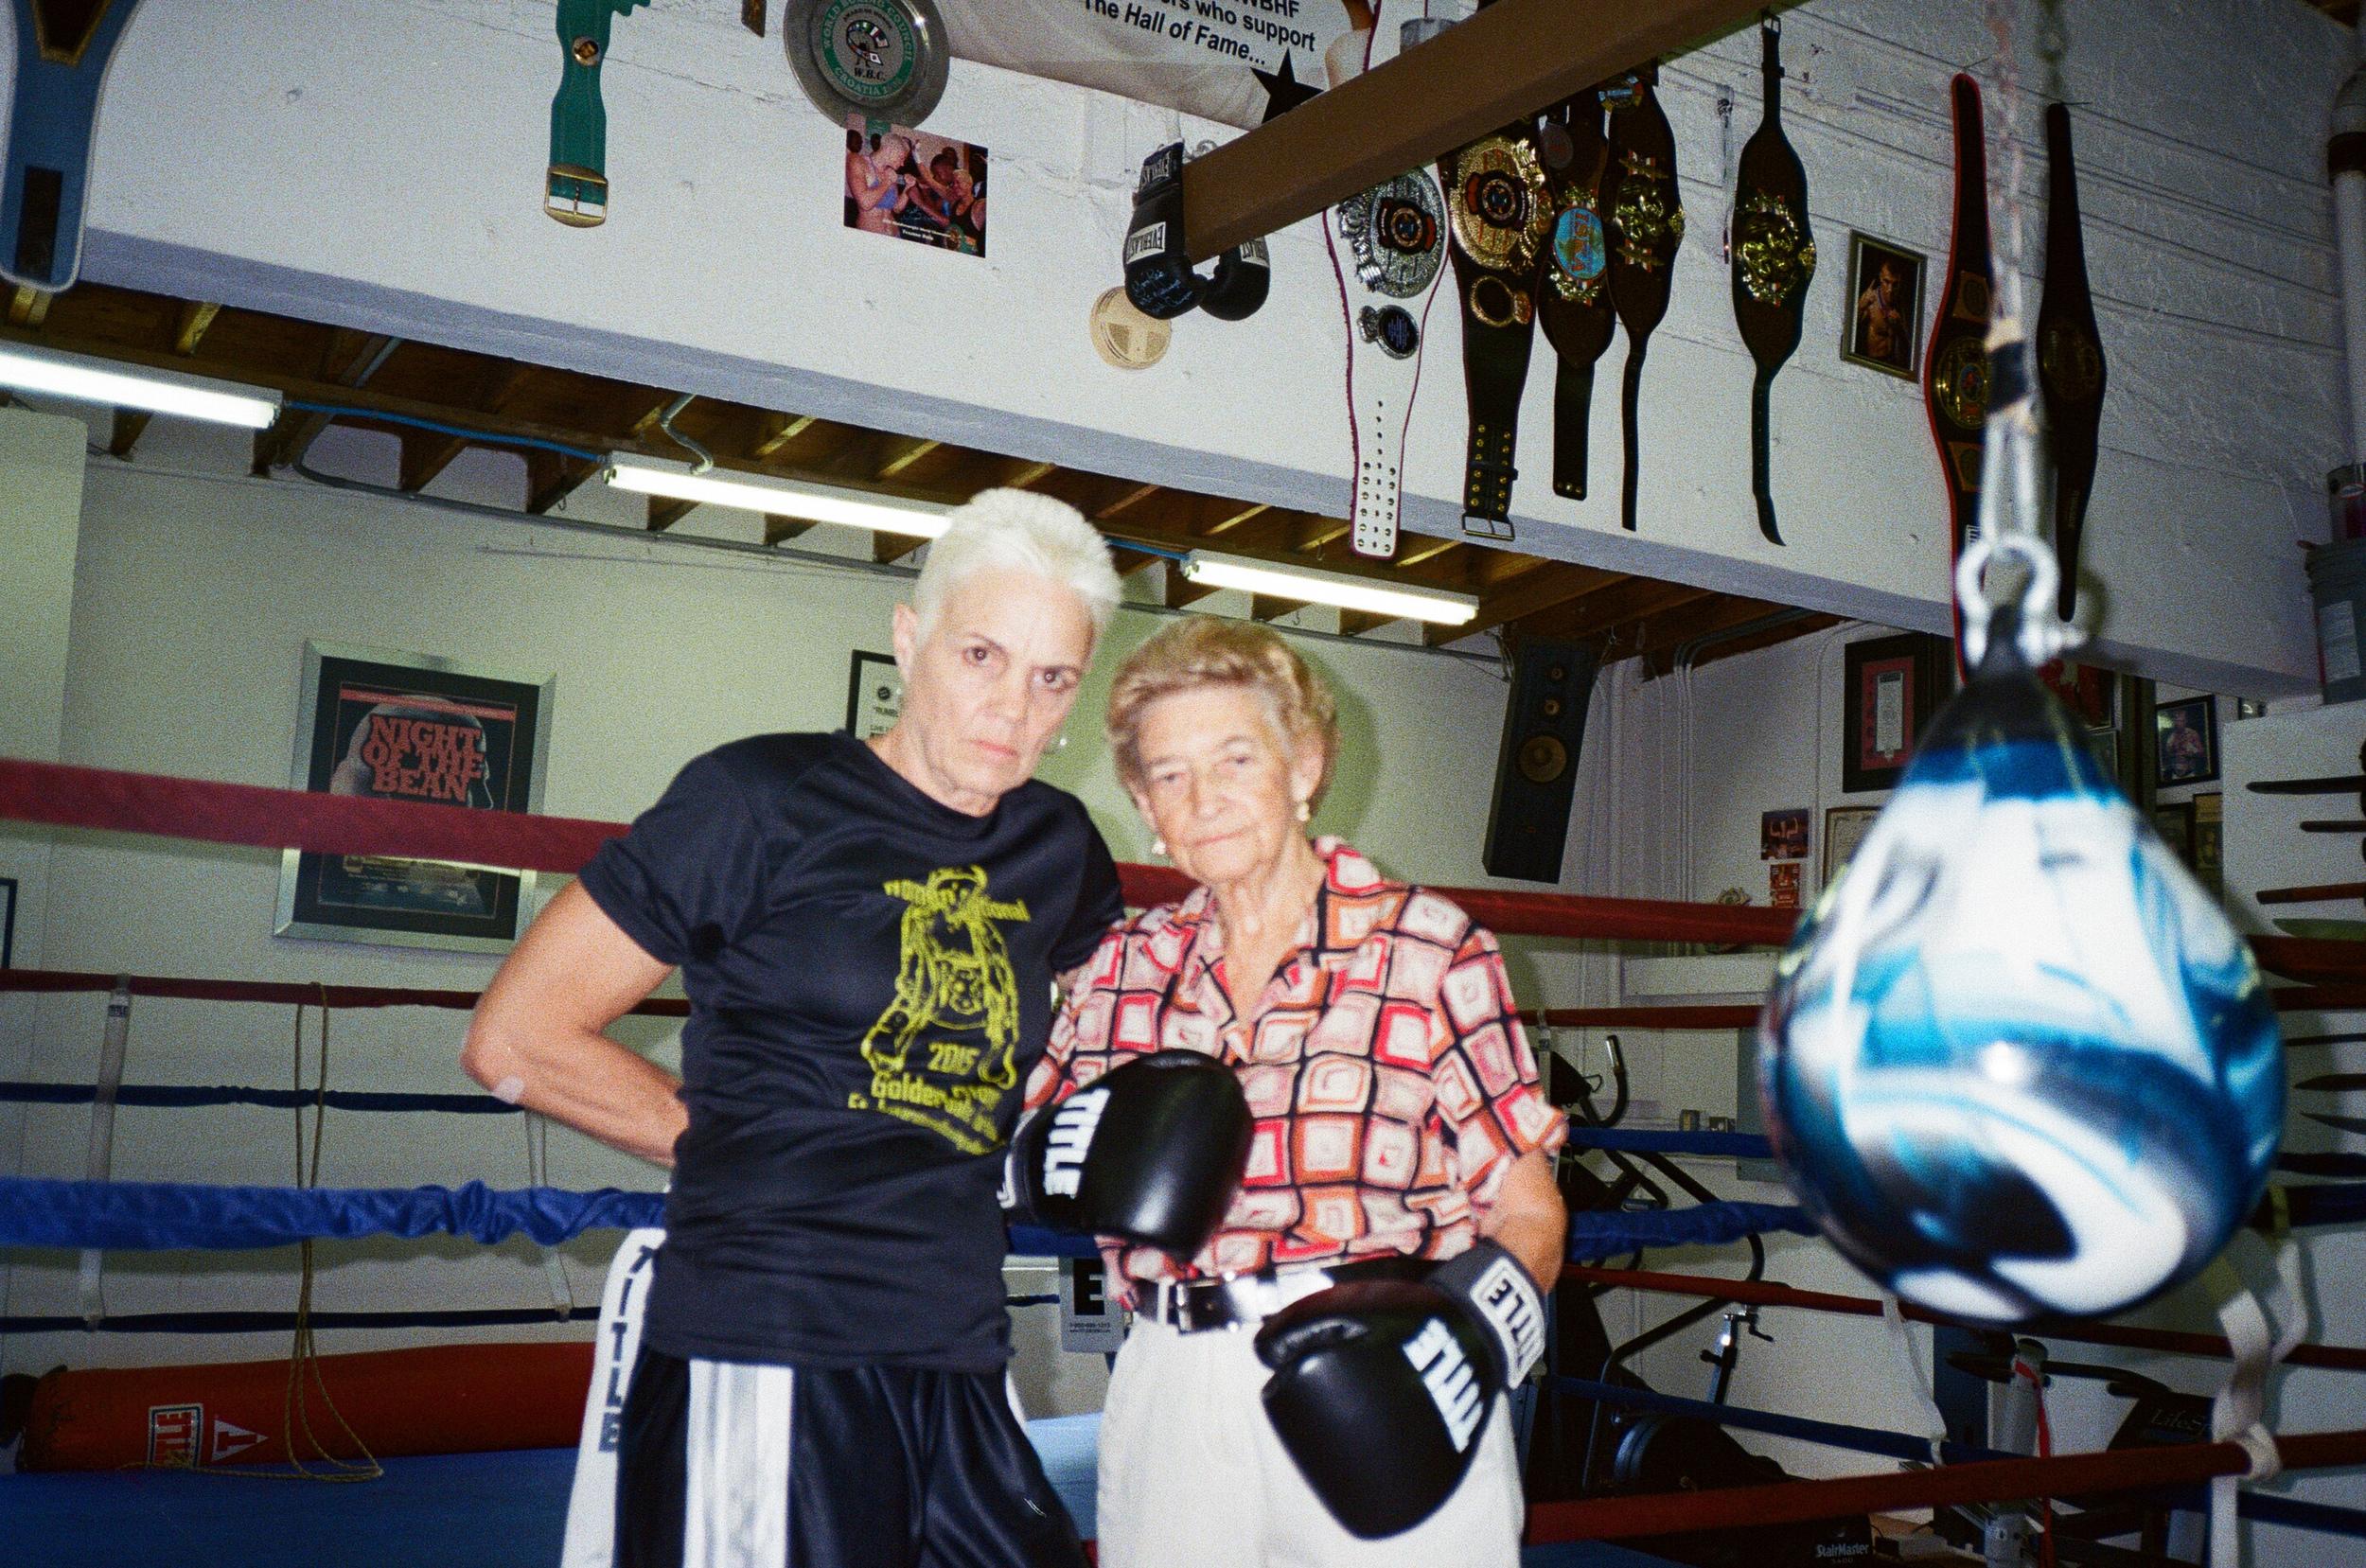 Thats my boxing-mom/coach Bonnie w Barbara... Bonnie is a (4x) world champion too.